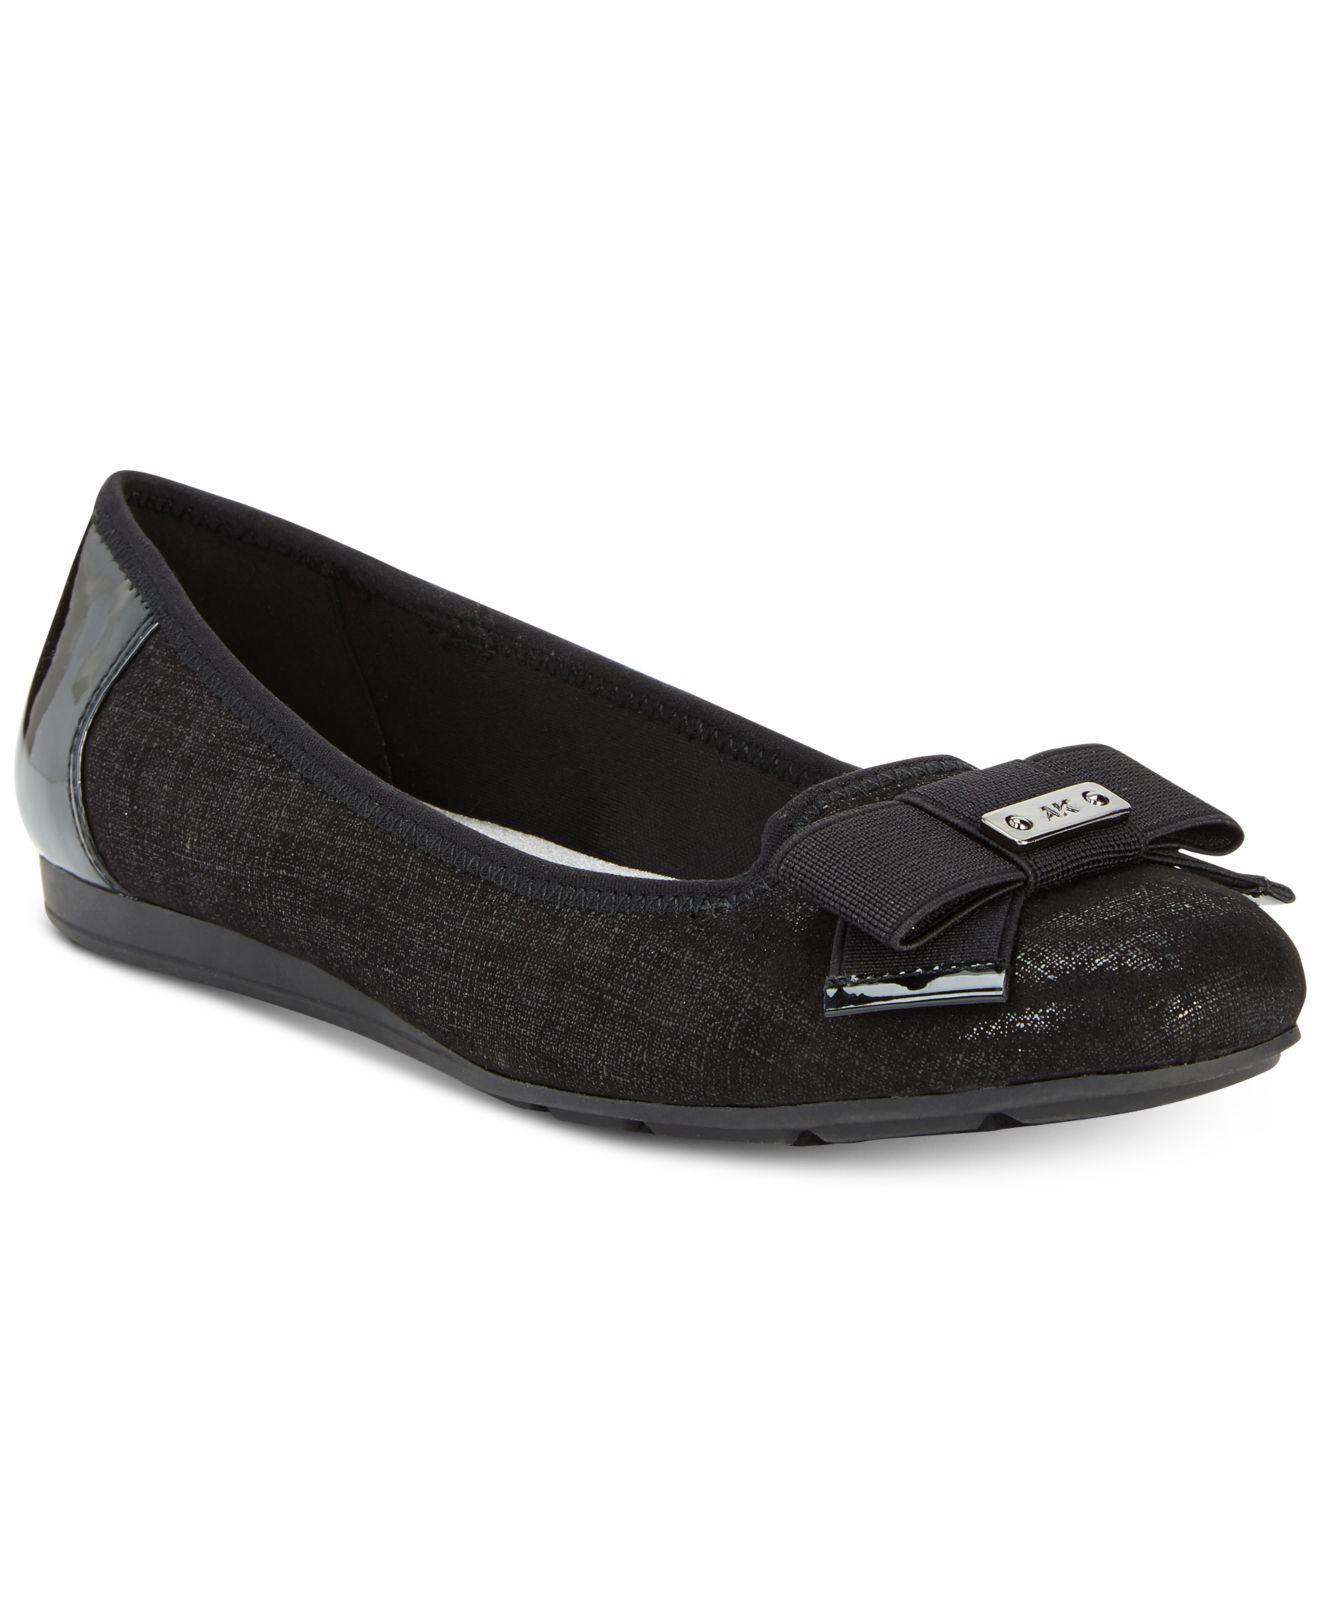 Anne Klein Flat Shoes, Flat Anne Klein Shoes